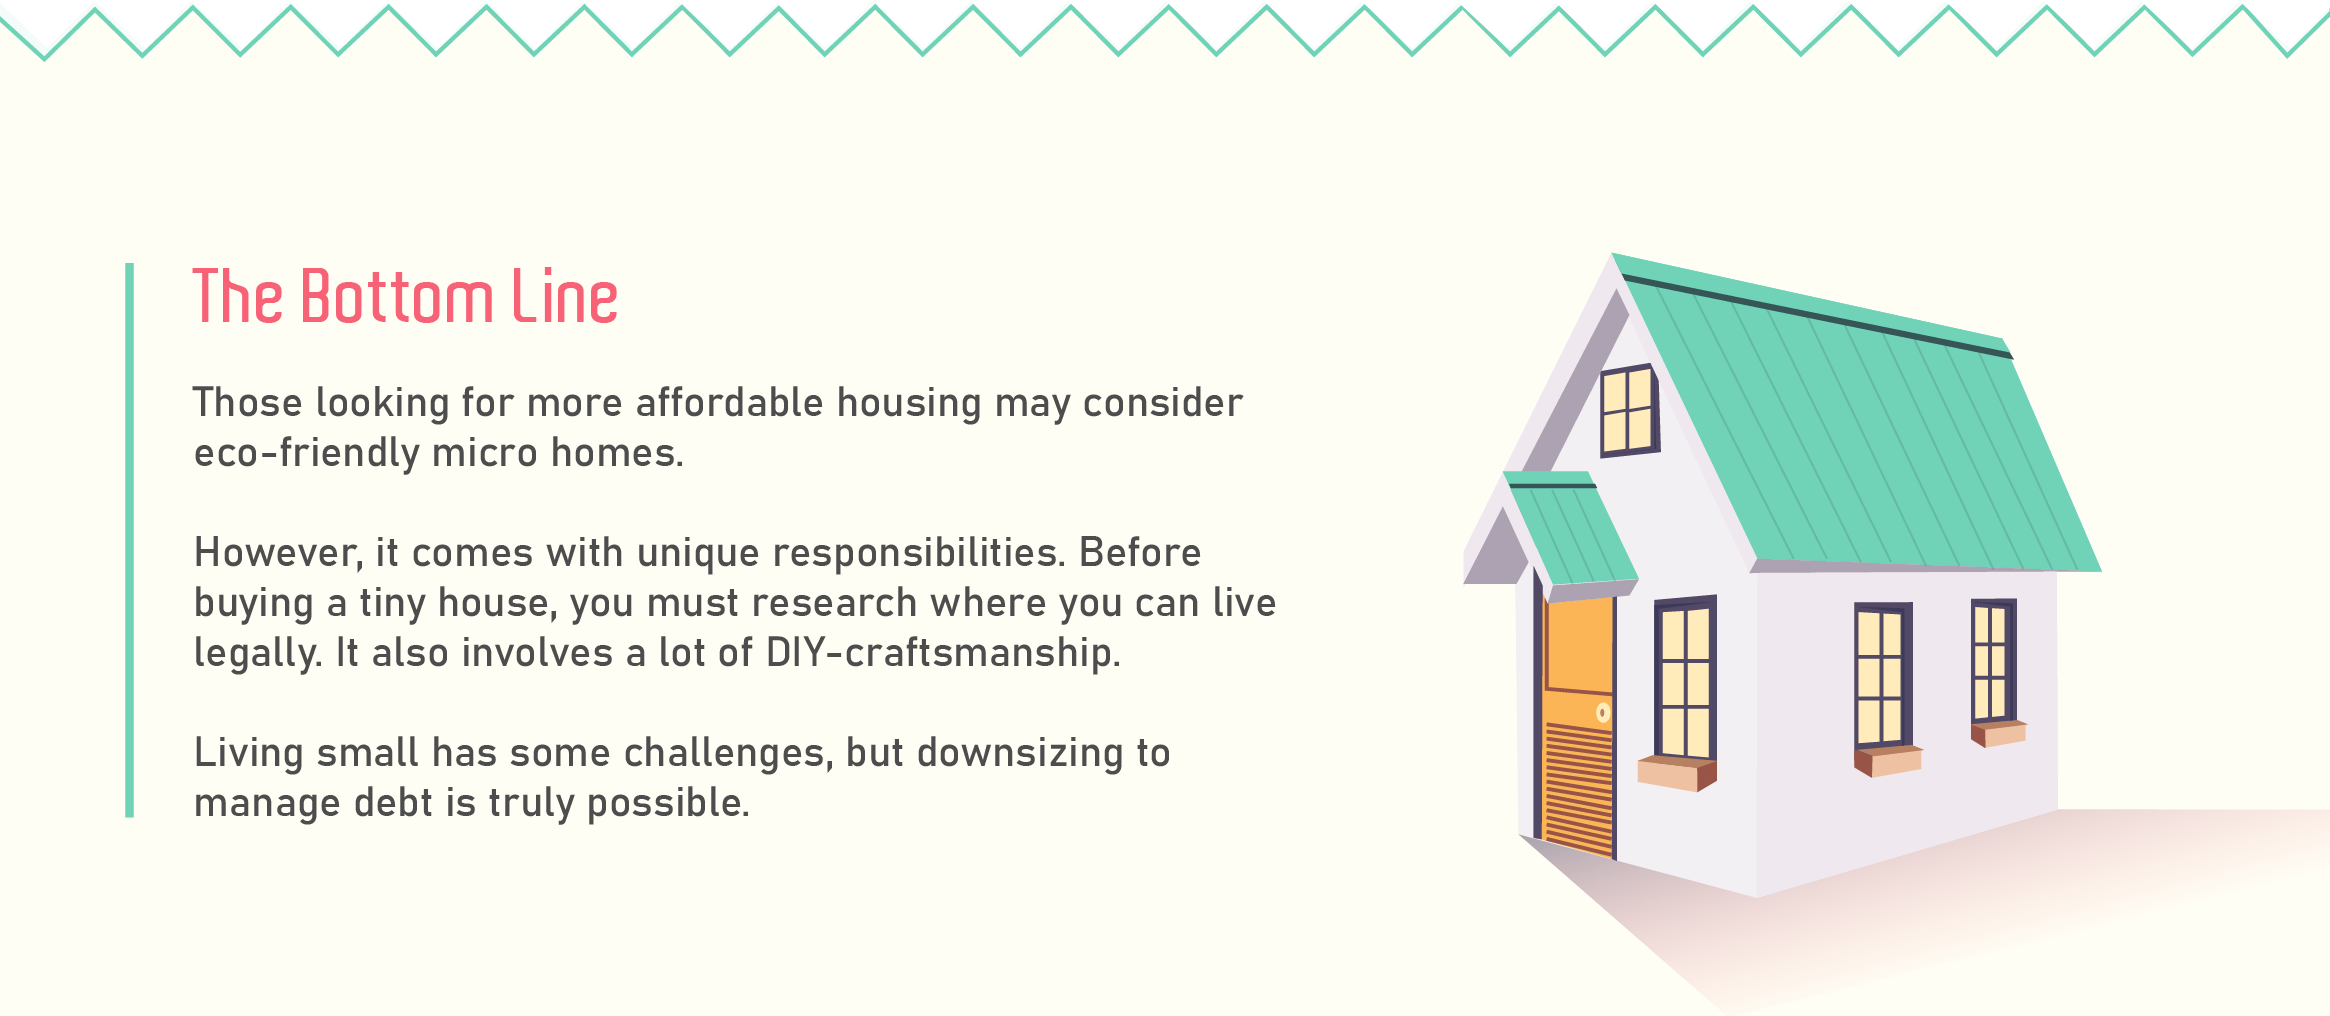 The bottom line for tiny homes